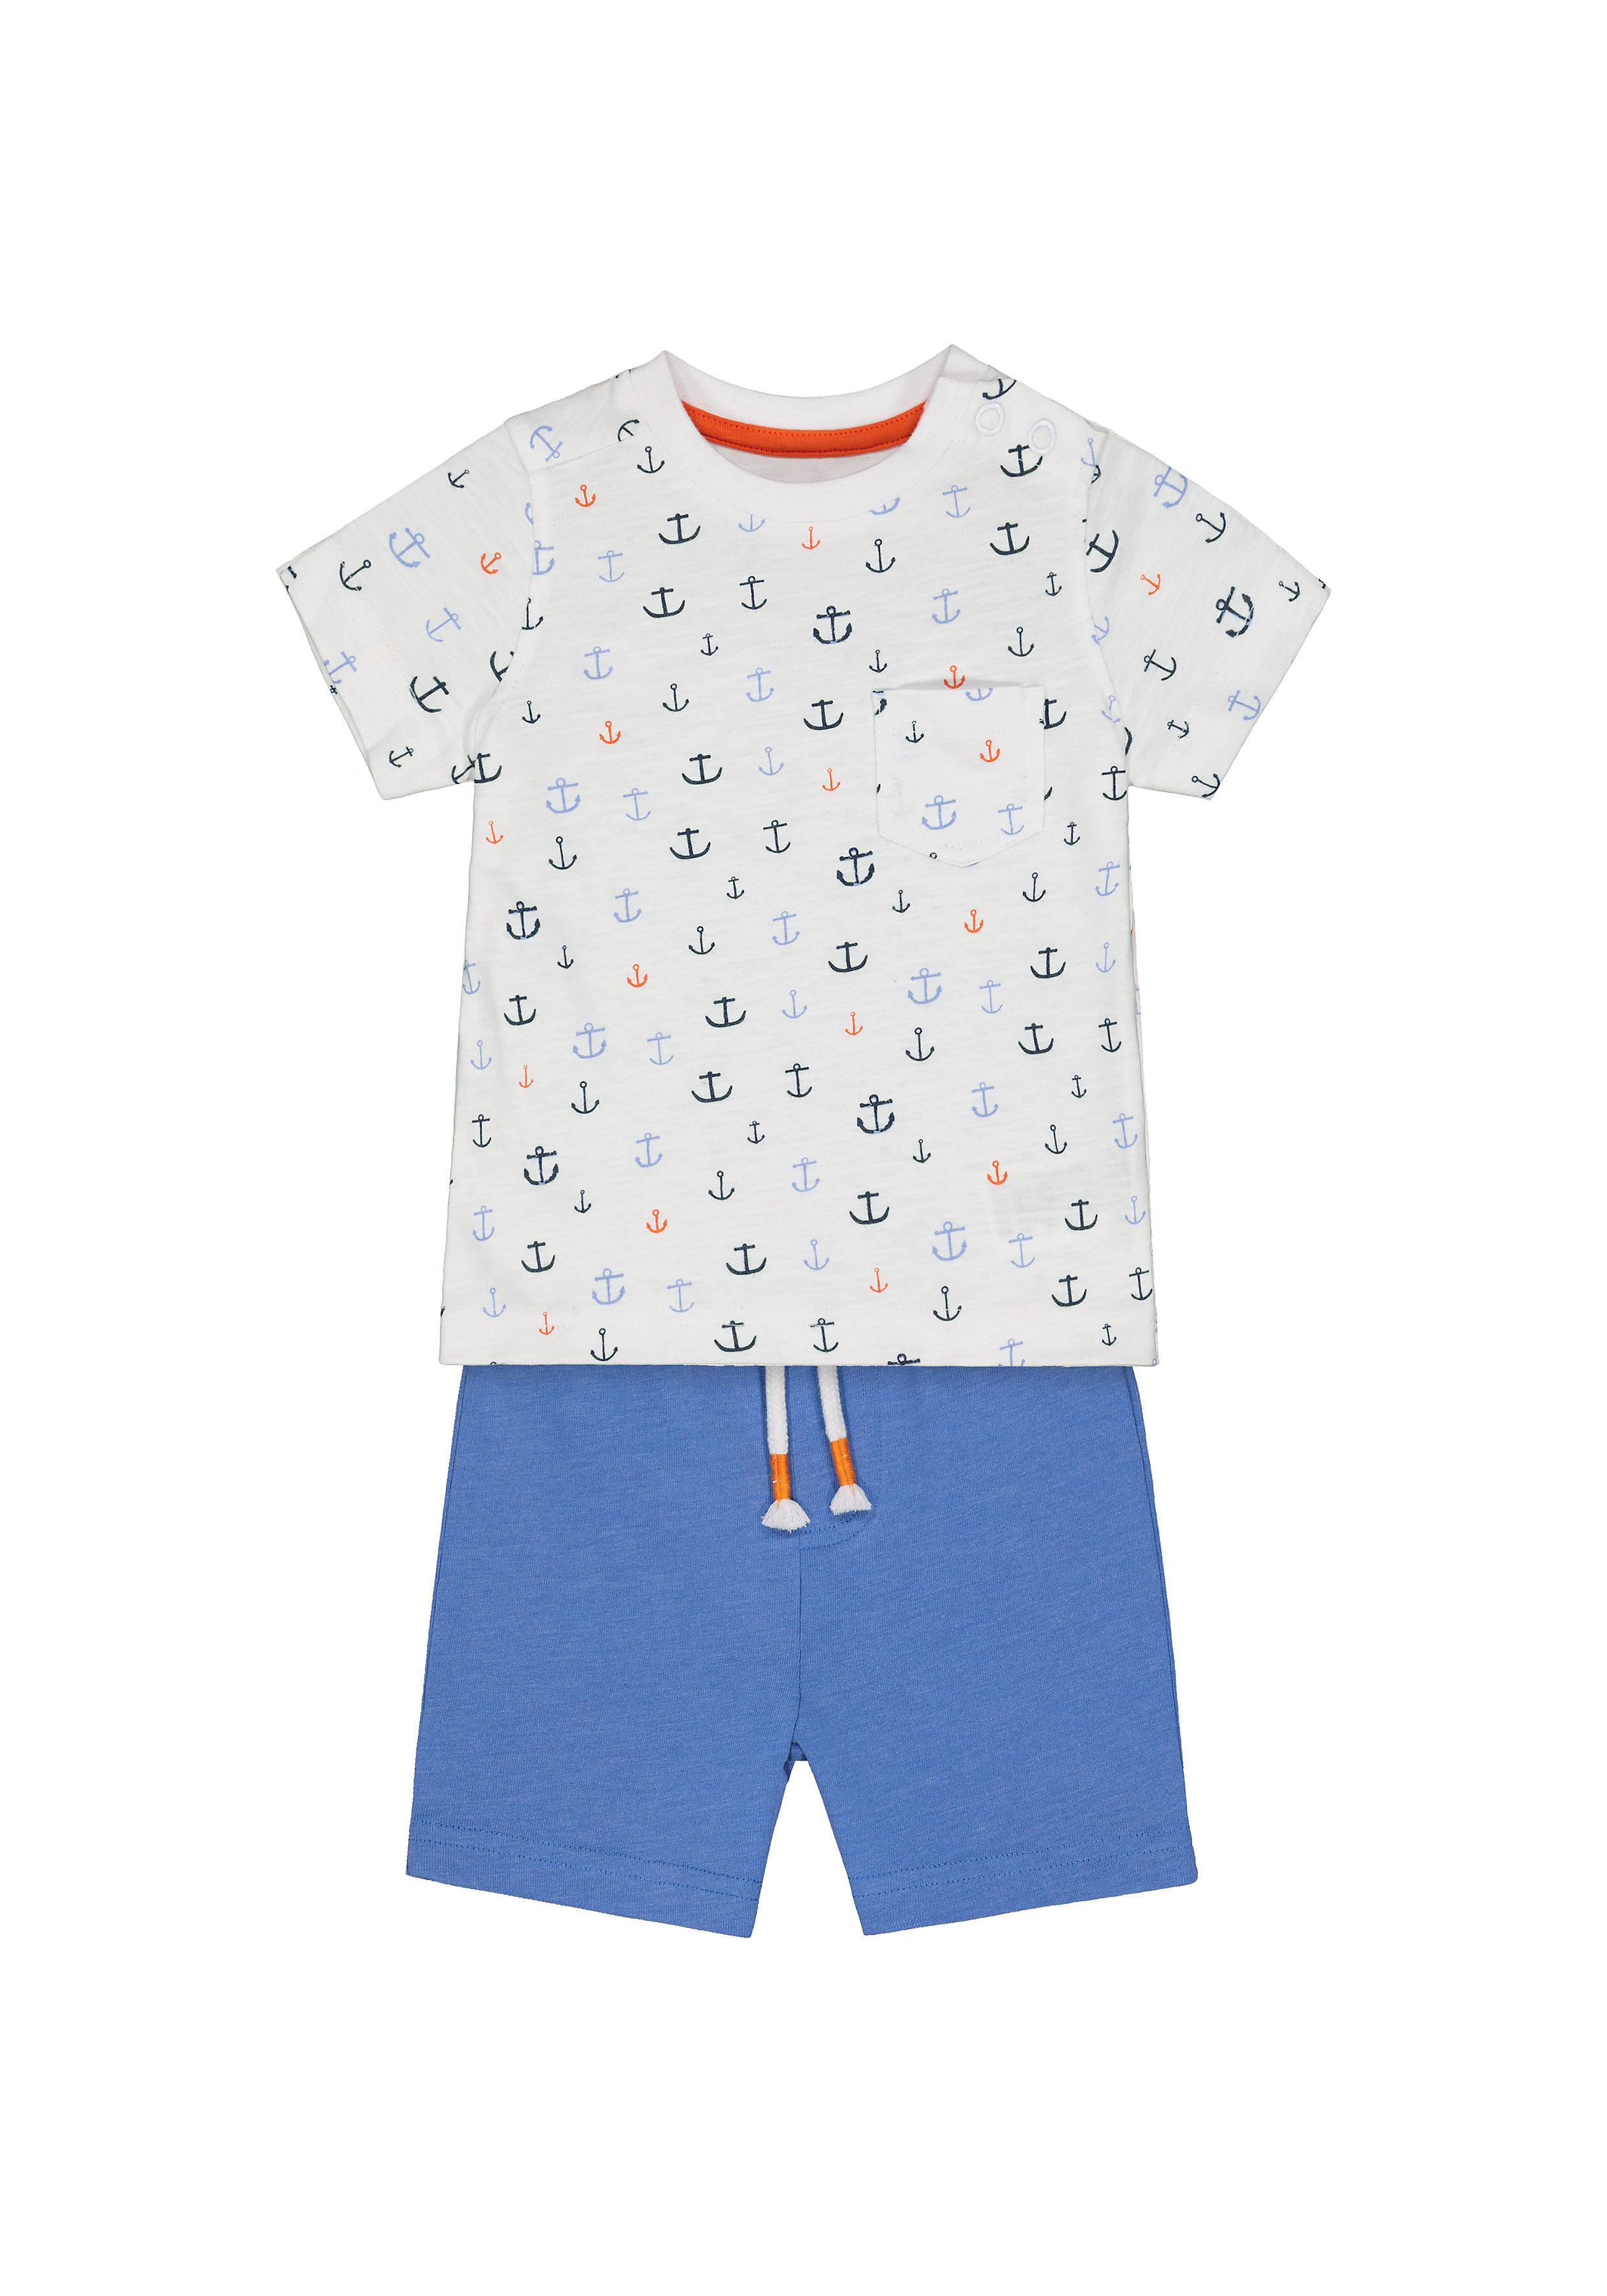 Mothercare | Boys Half Sleeves T-Shirt And Shorts Set Anchor Print - Multicolor